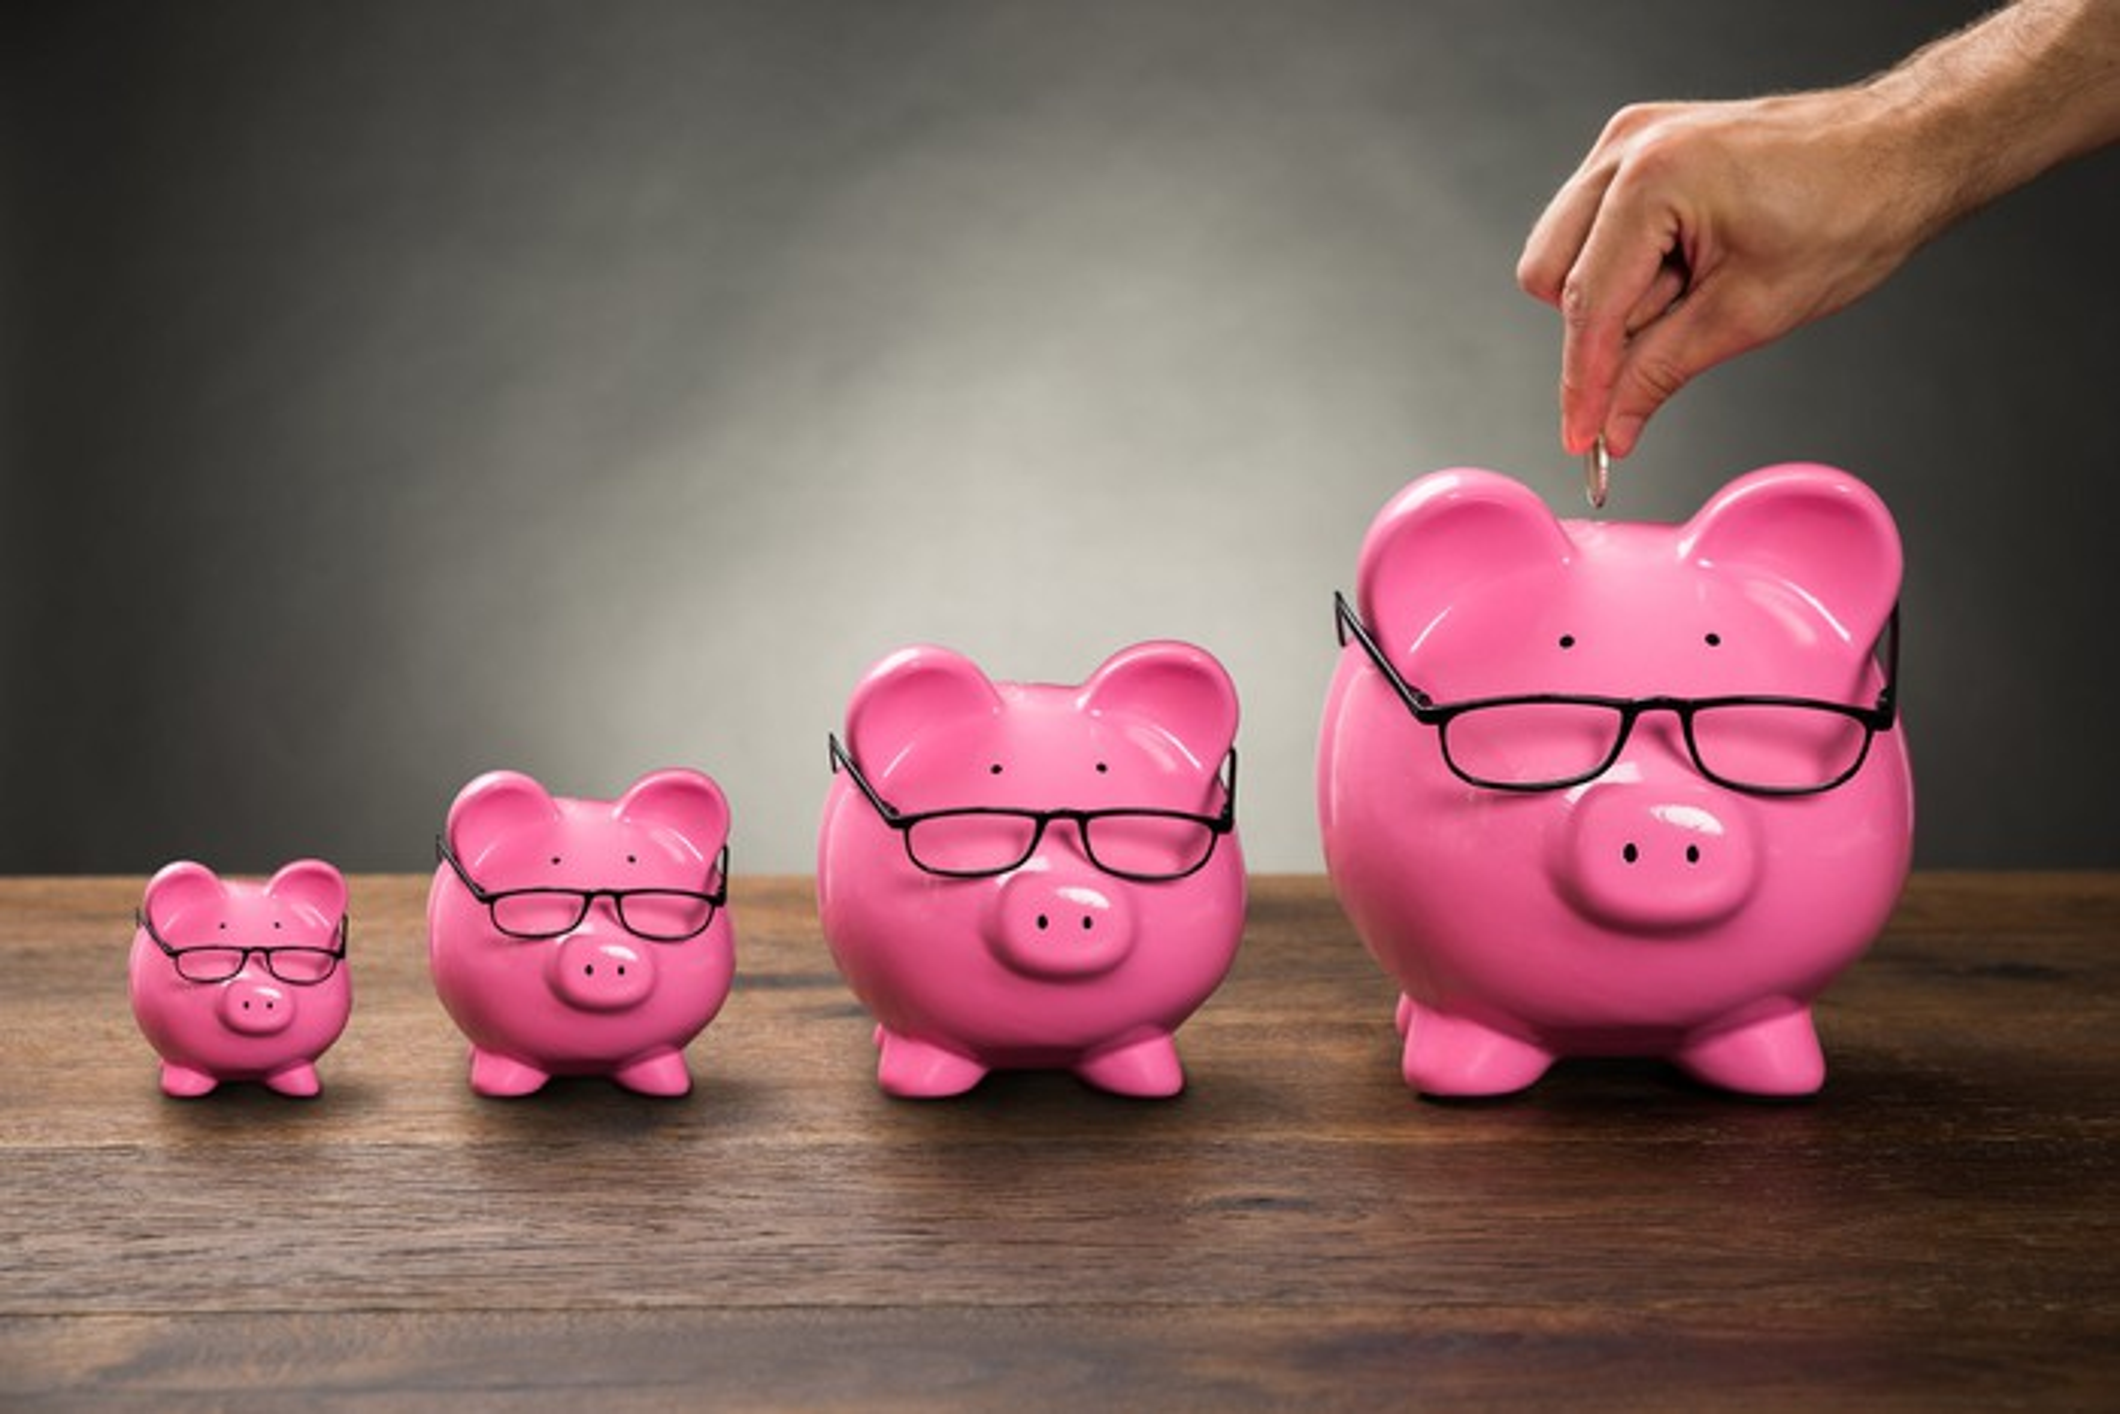 Piggy banks growing